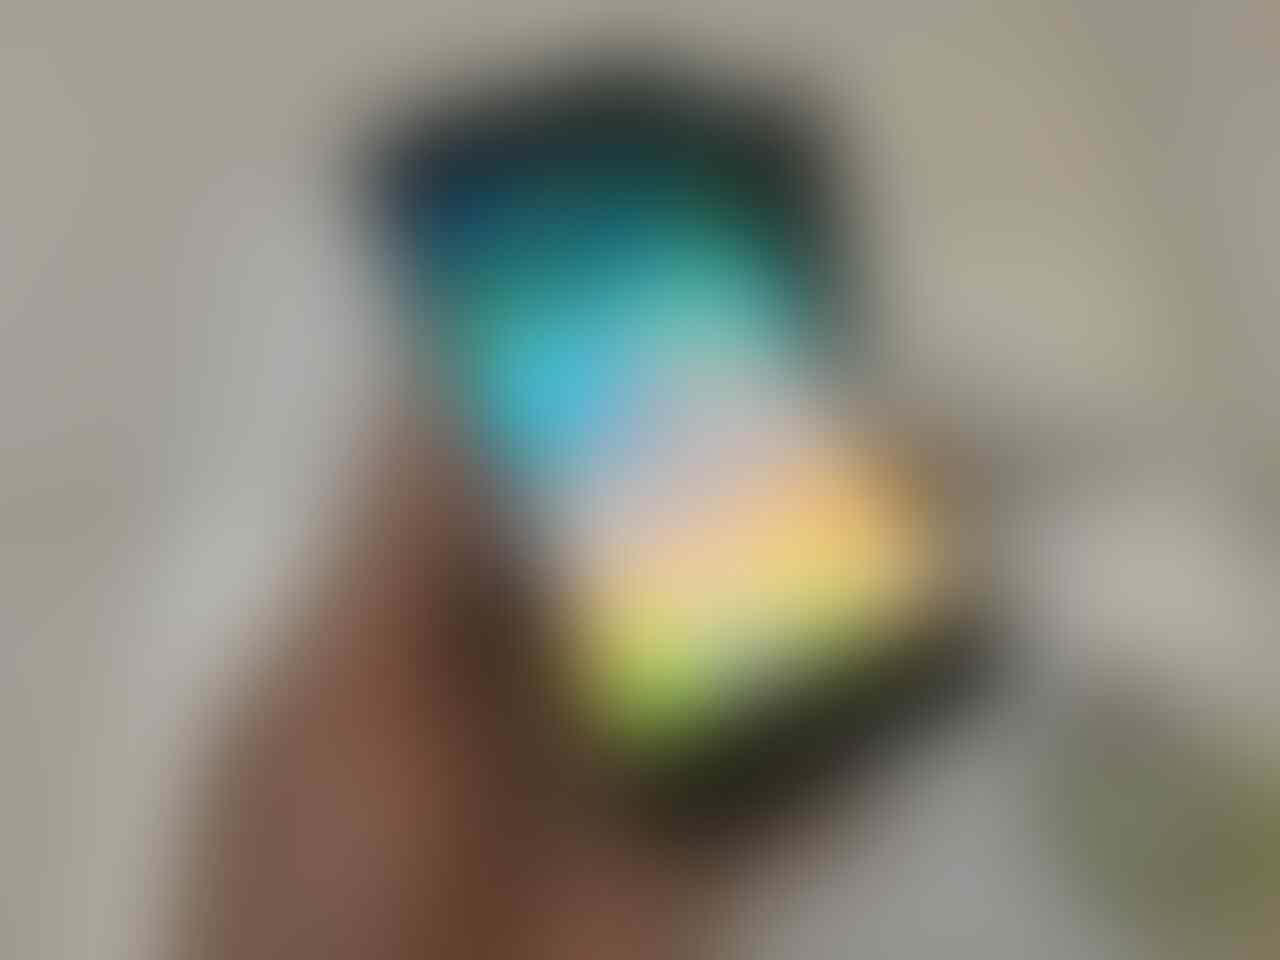 IPHONE 7 BLACKMATTE 128GB FULLSET MULUUSS MURAAAHH 6700 SAJA [MALANG]